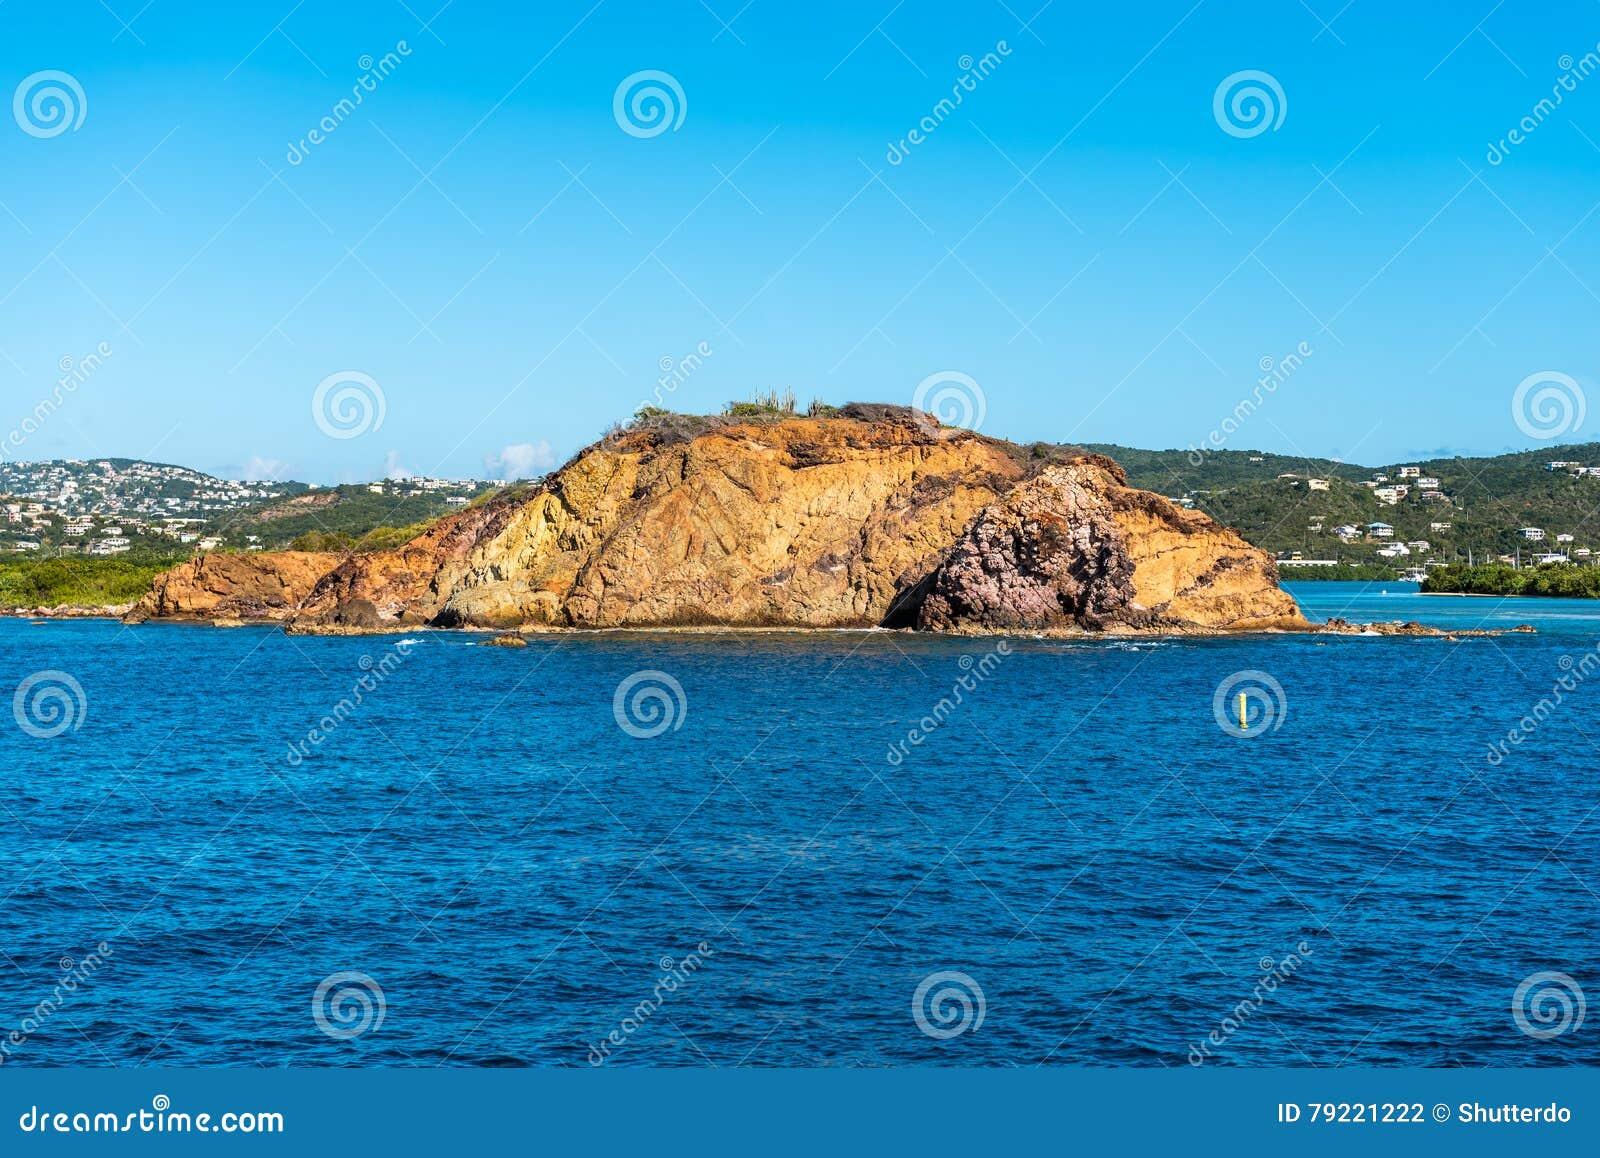 Rock formation in Caribbean Sea